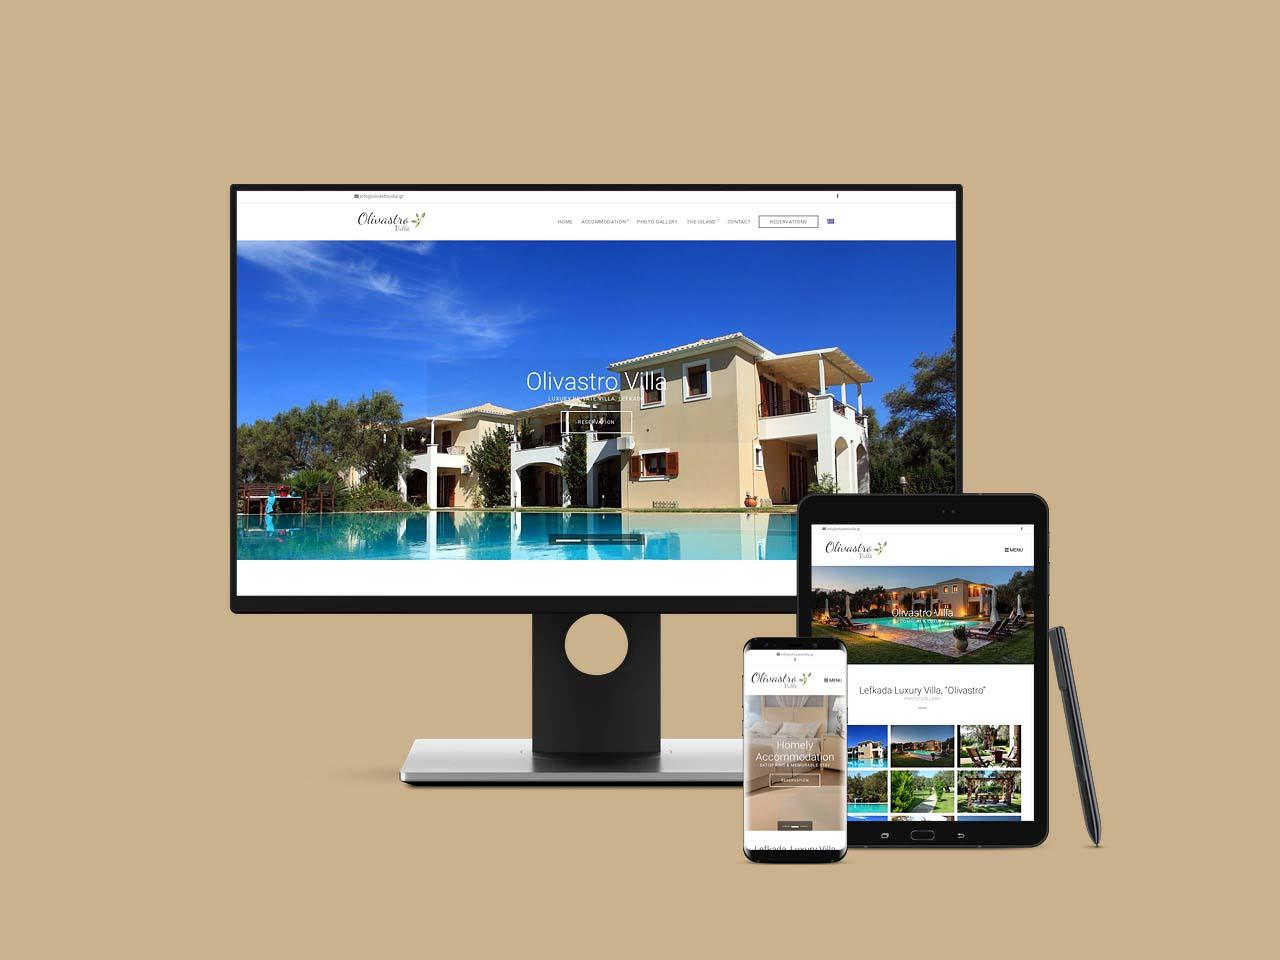 Olivastro Villa Lefkada Luxury Villas